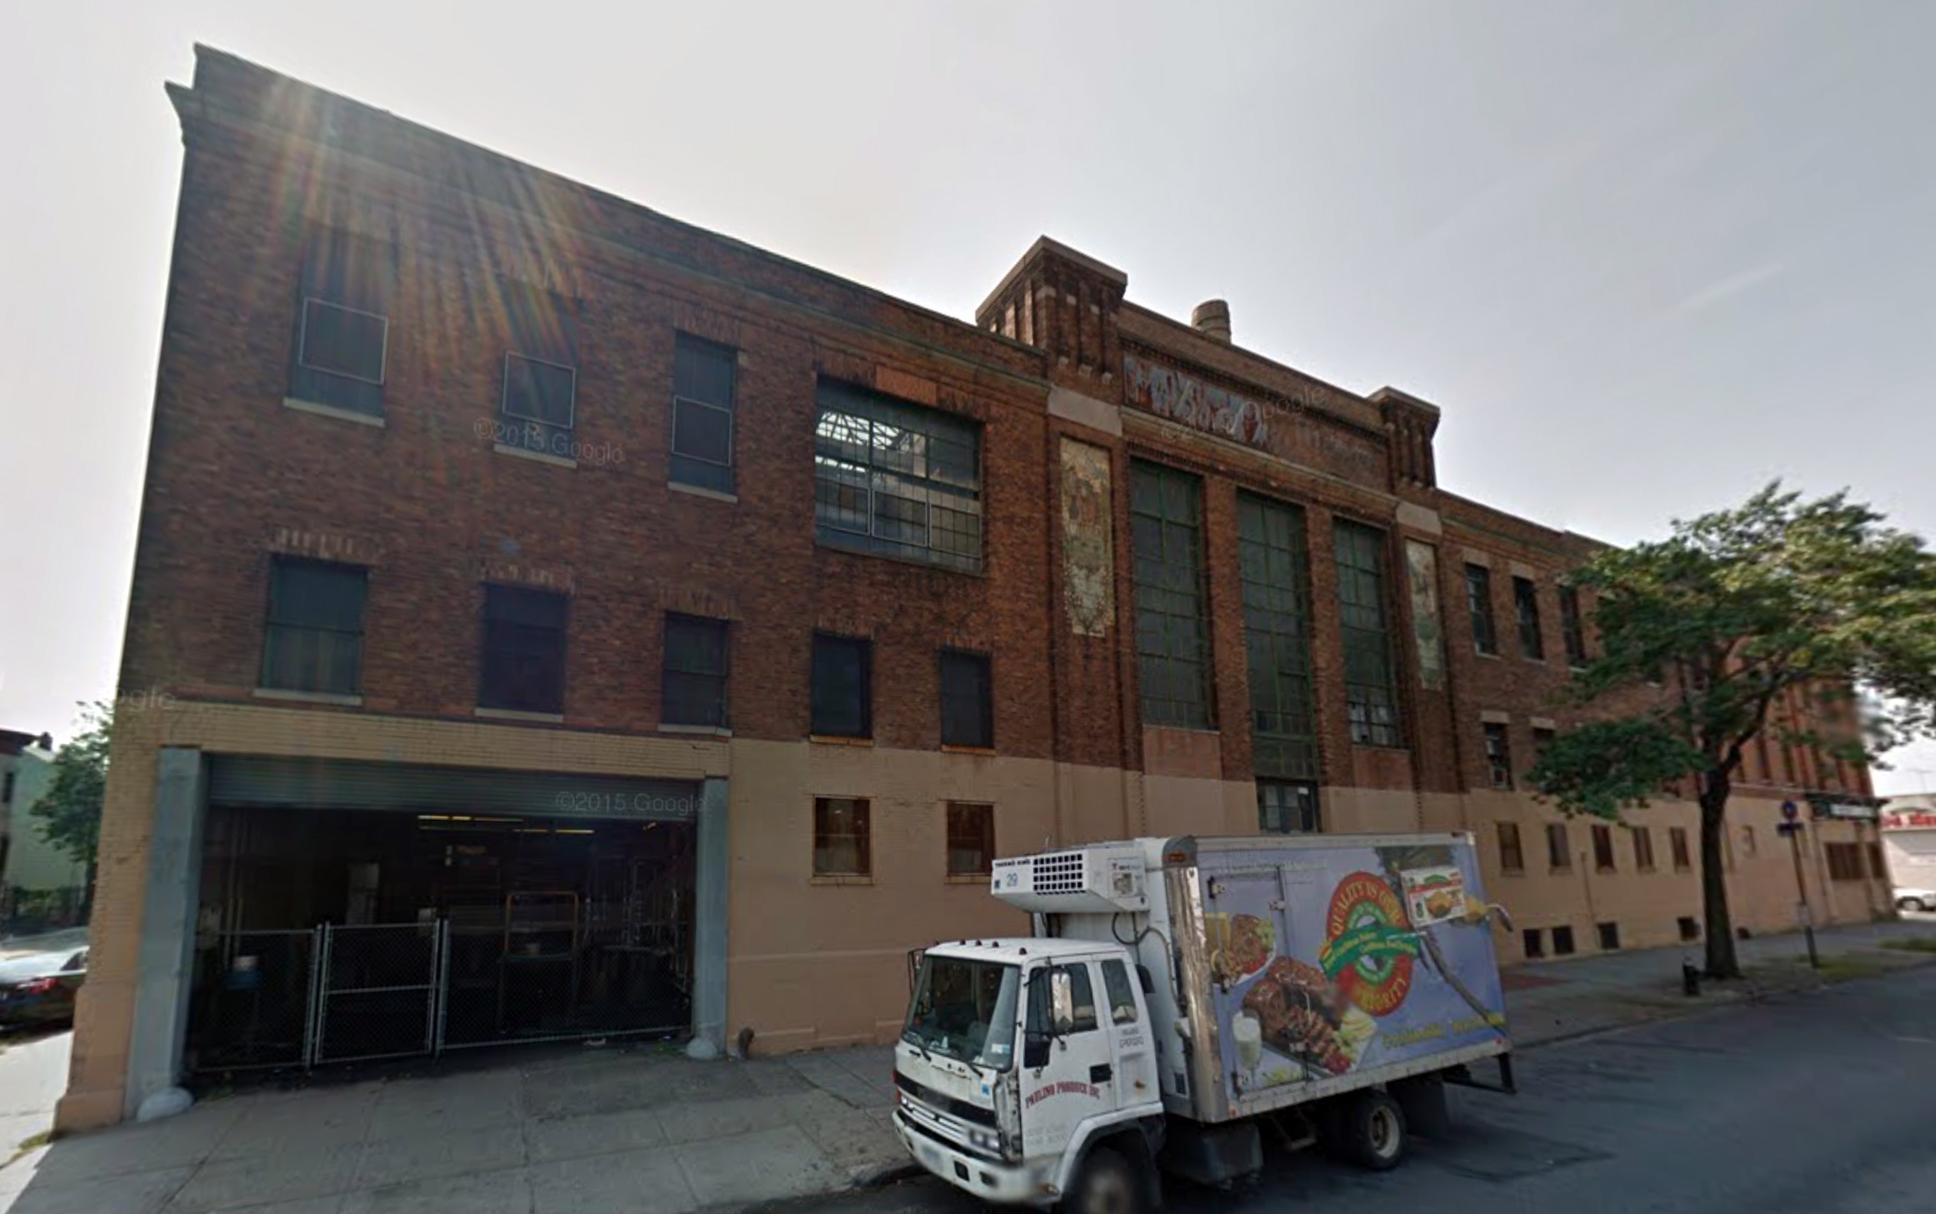 Empire State Dairy Co., 2840 Atlantic Avenue, 2013. Via Google Maps